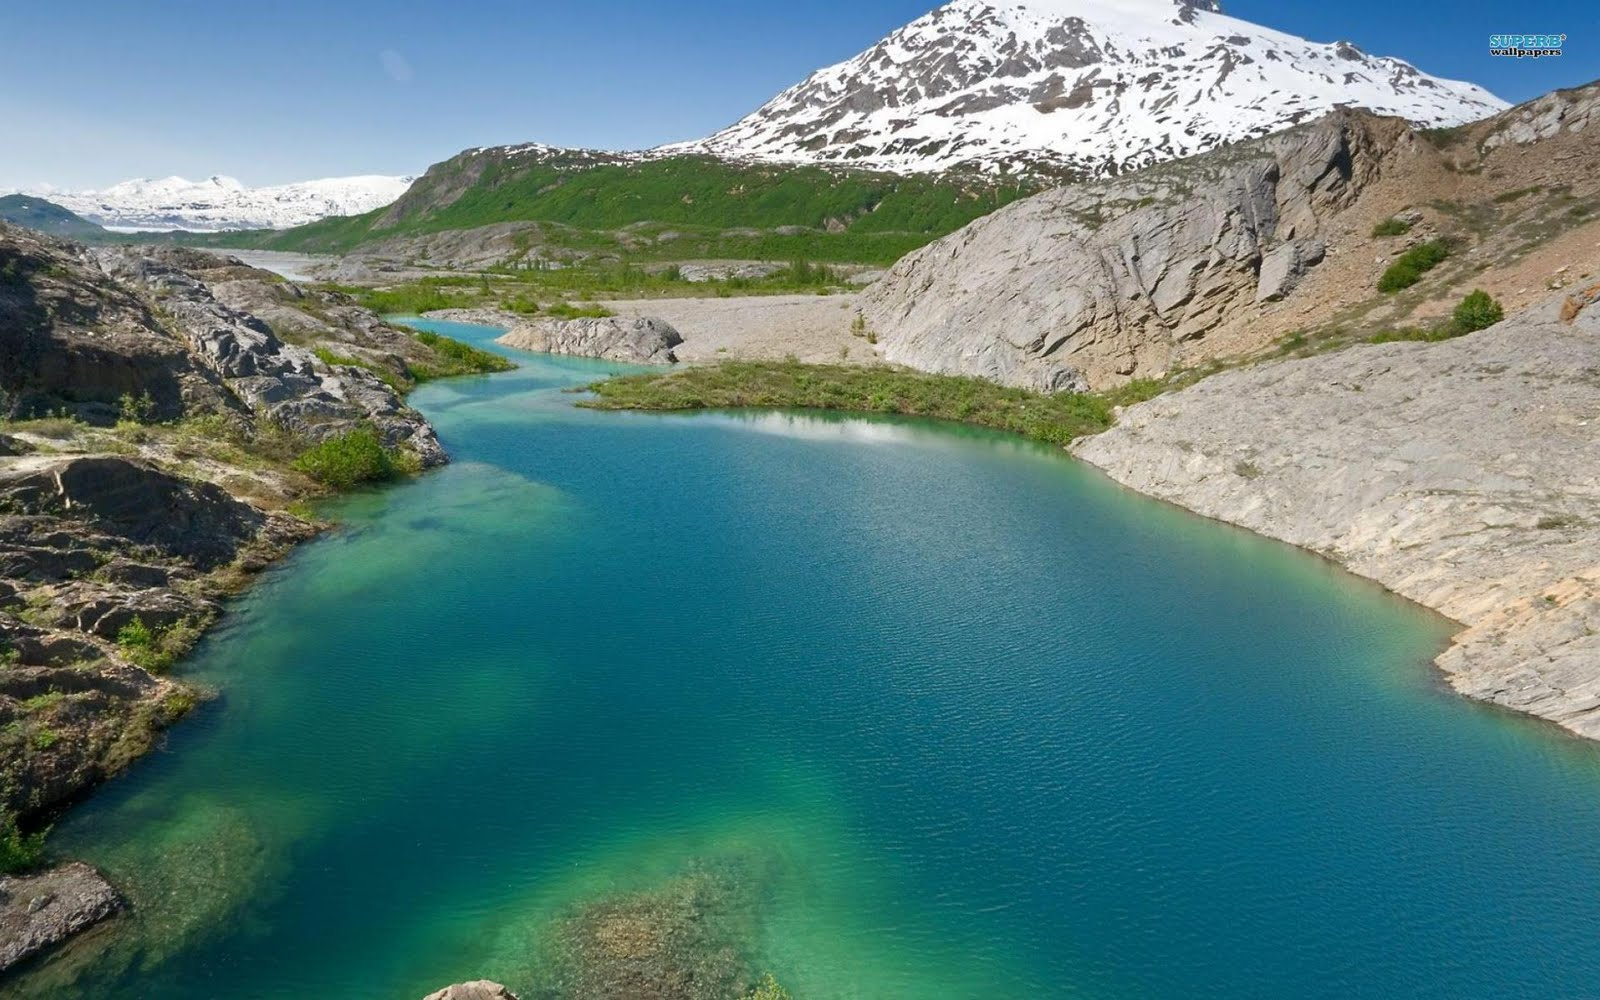 http://4.bp.blogspot.com/-reblENdQY-Q/TcwU1yfqL3I/AAAAAAAANOw/uCqWC_7JOc4/s1600/lake-along-the-alsek-river-1145-1920x1200.jpg